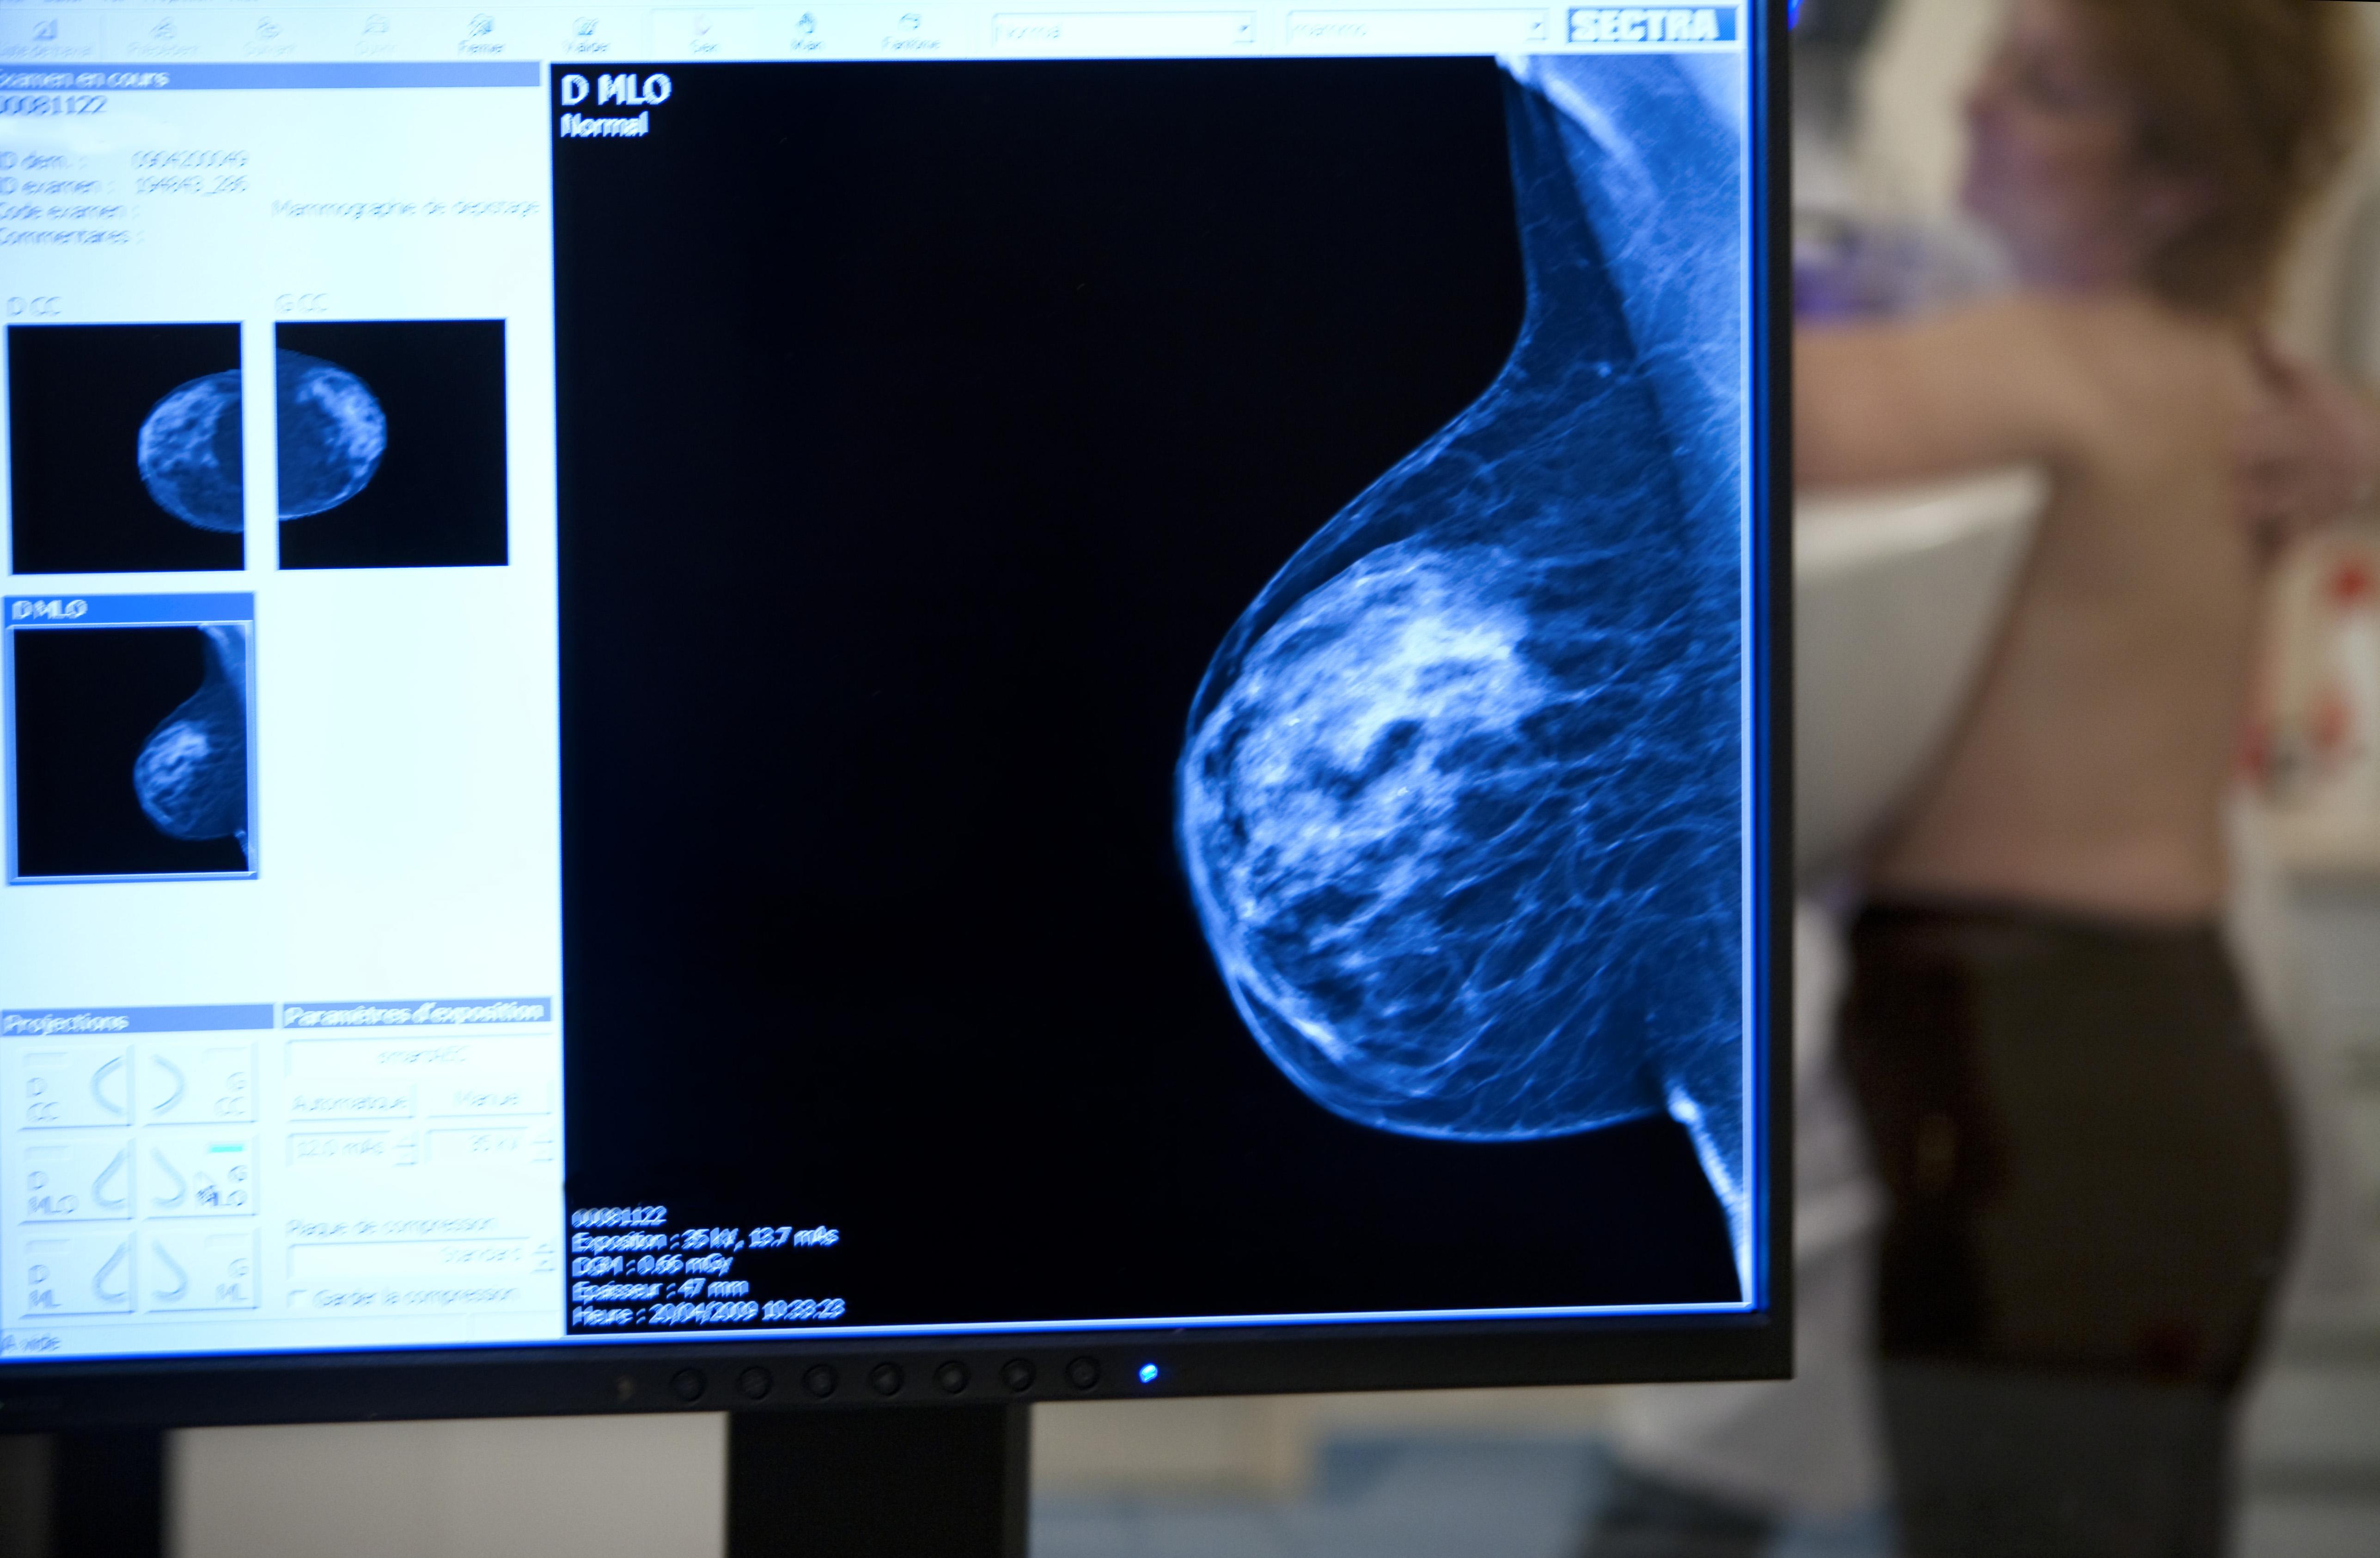 Oncolog-Hematolog Nr. 34 (1/) by Versa Media - Issuu